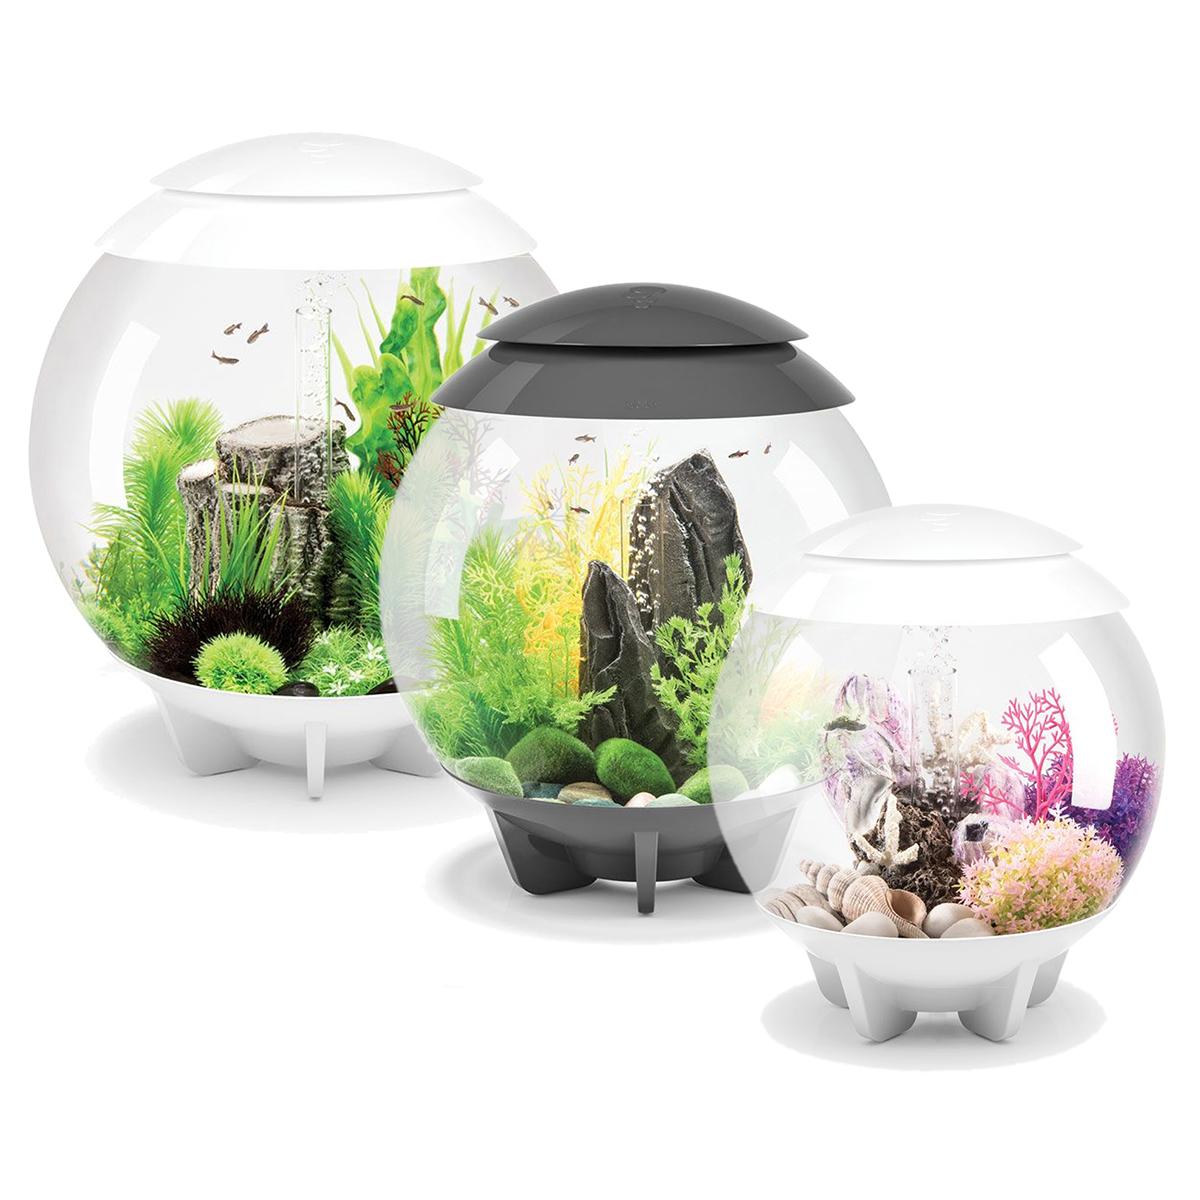 biorb halo aquarium 15l 30l 60l fish tank all in one setup. Black Bedroom Furniture Sets. Home Design Ideas